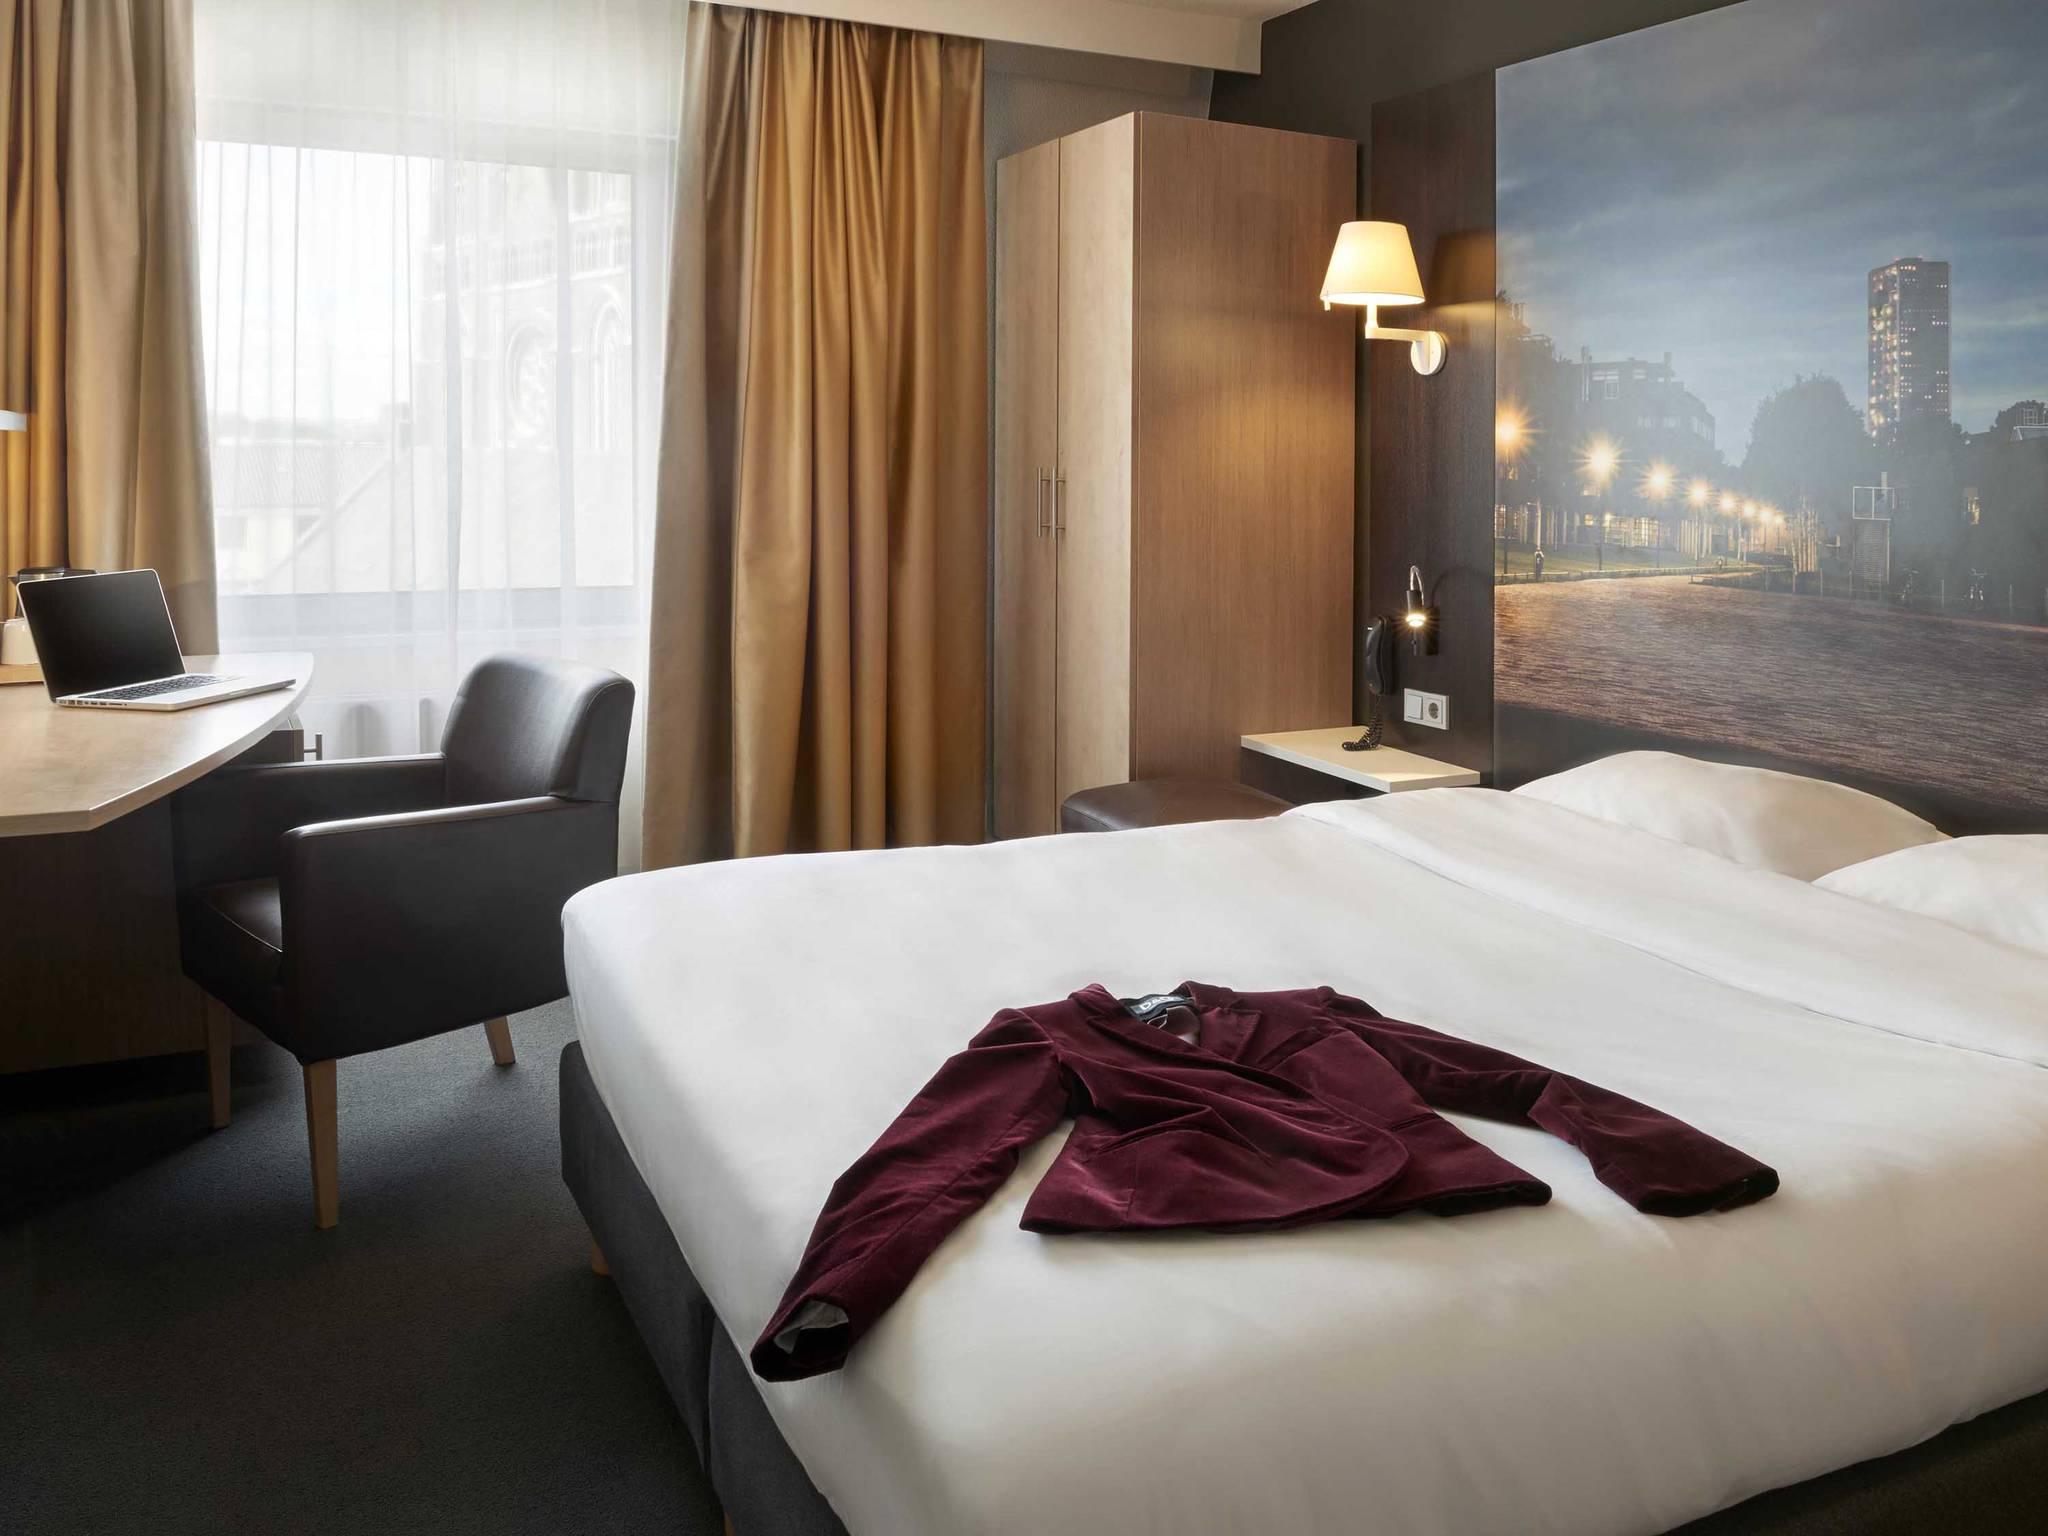 Hôtel - Mercure Hotel Tilburg Centrum